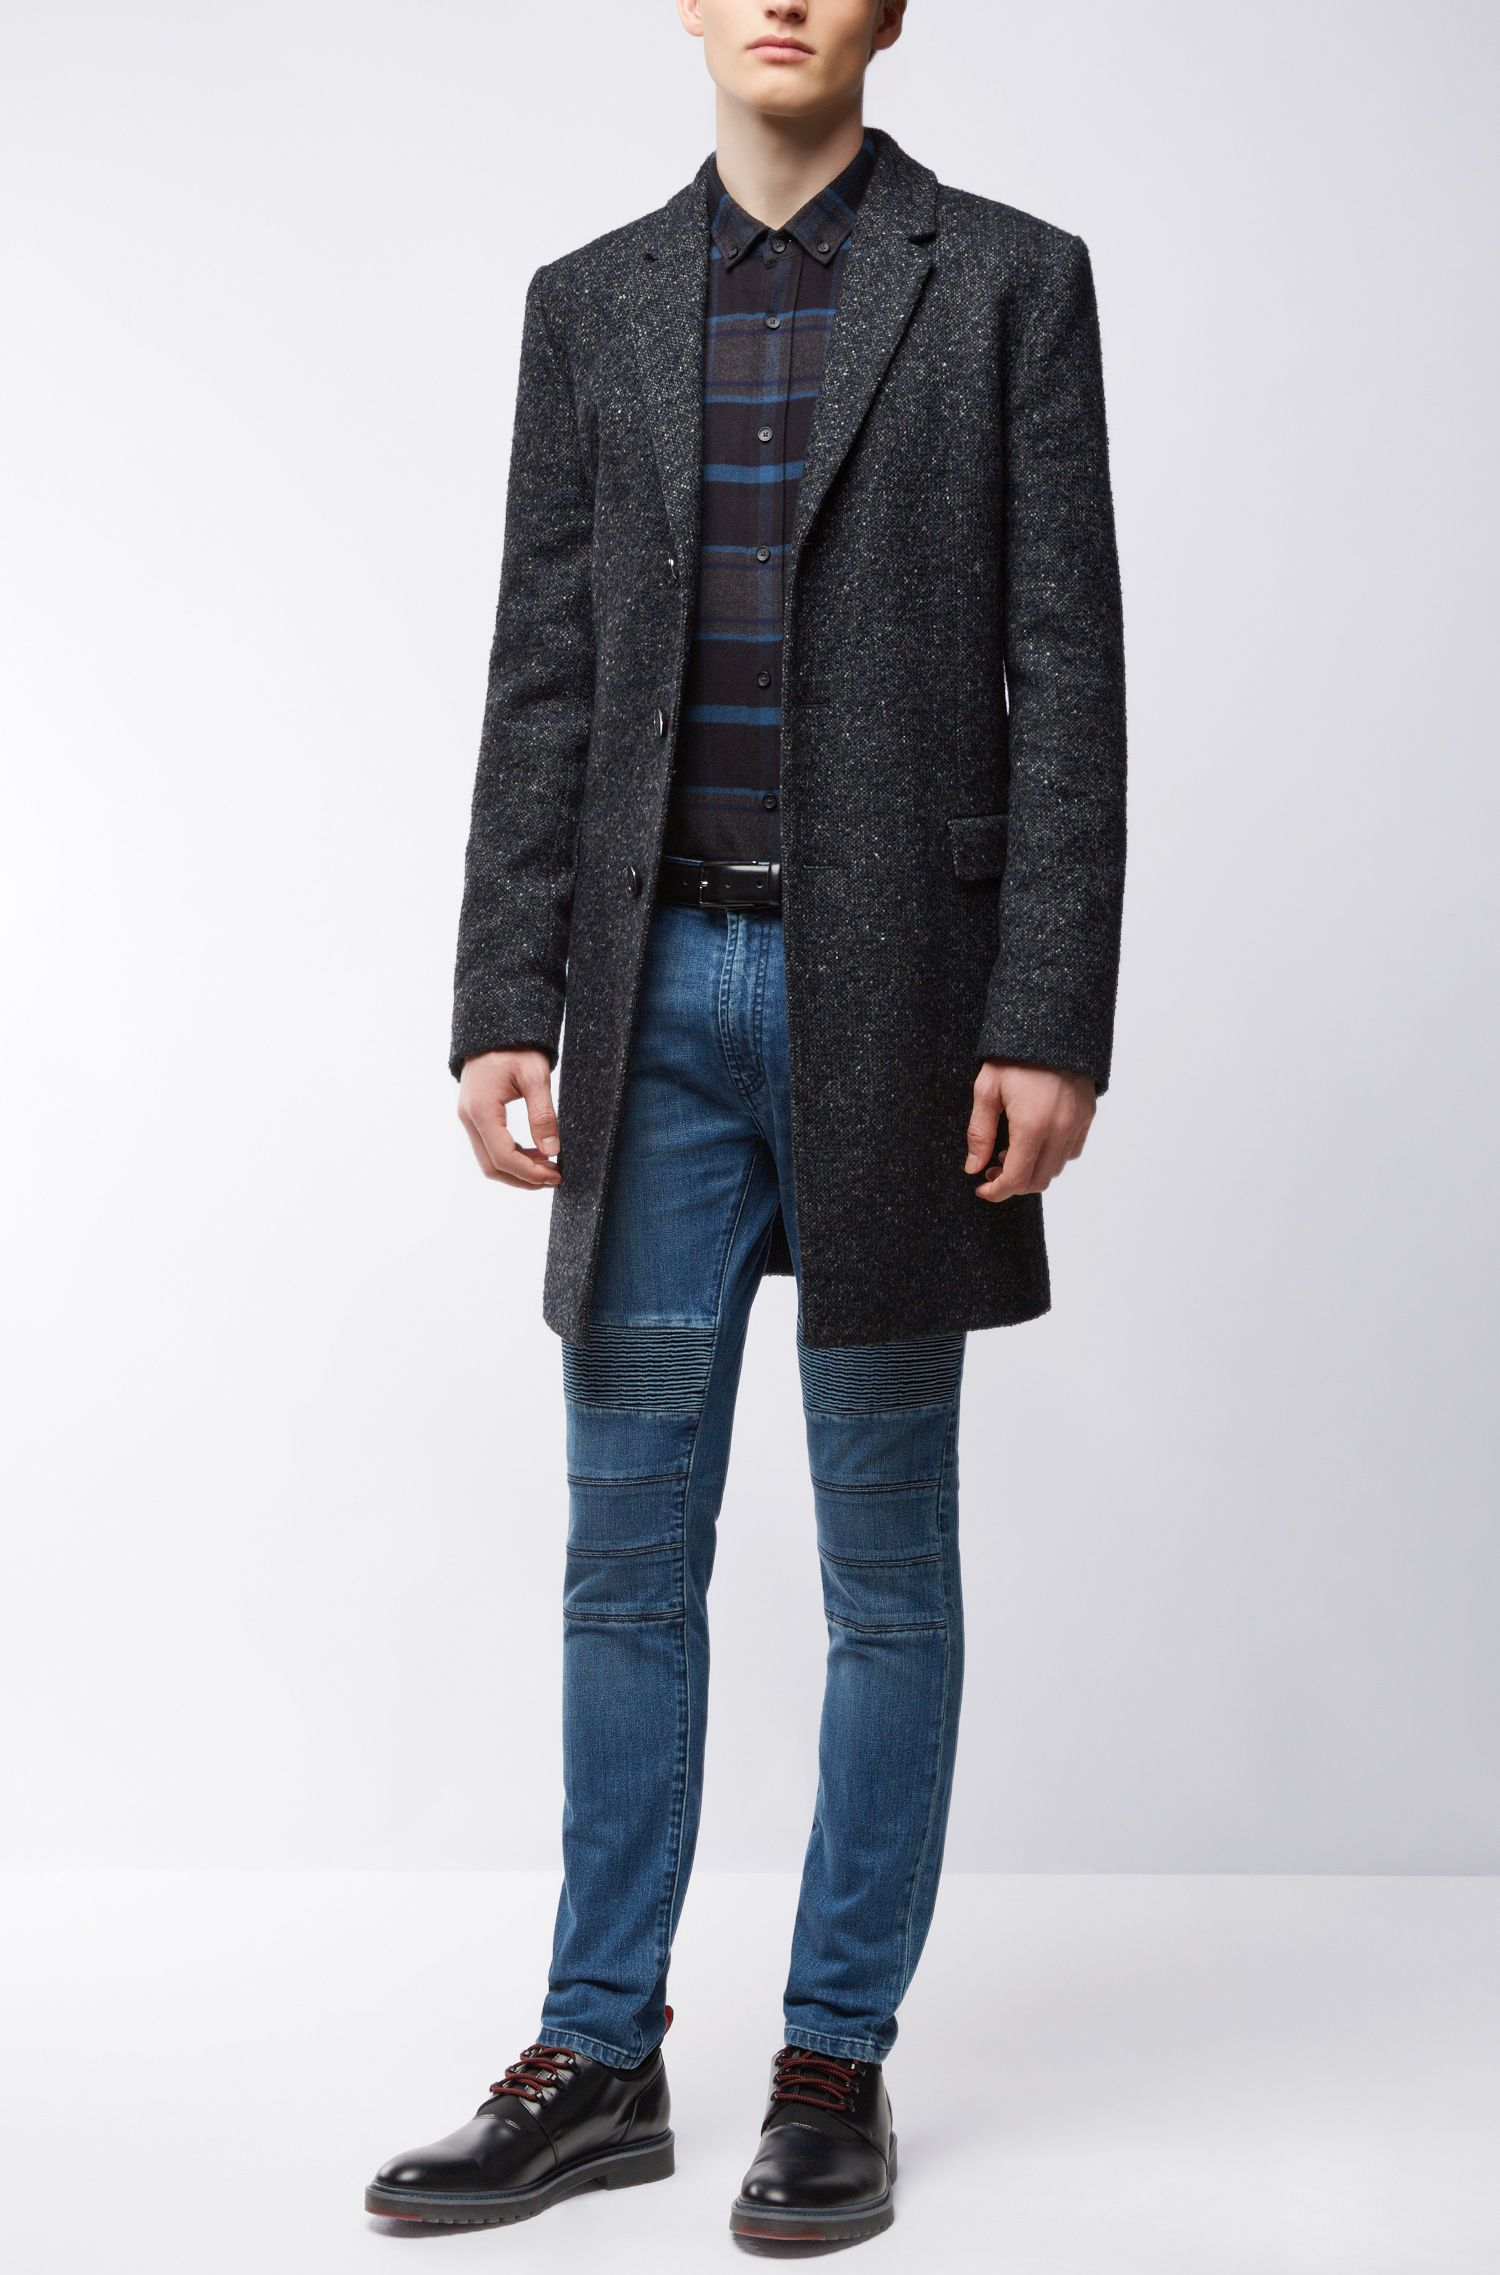 10.75 oz Stretch Cotton Blend Jeans, Skinny Fit | Hugo734